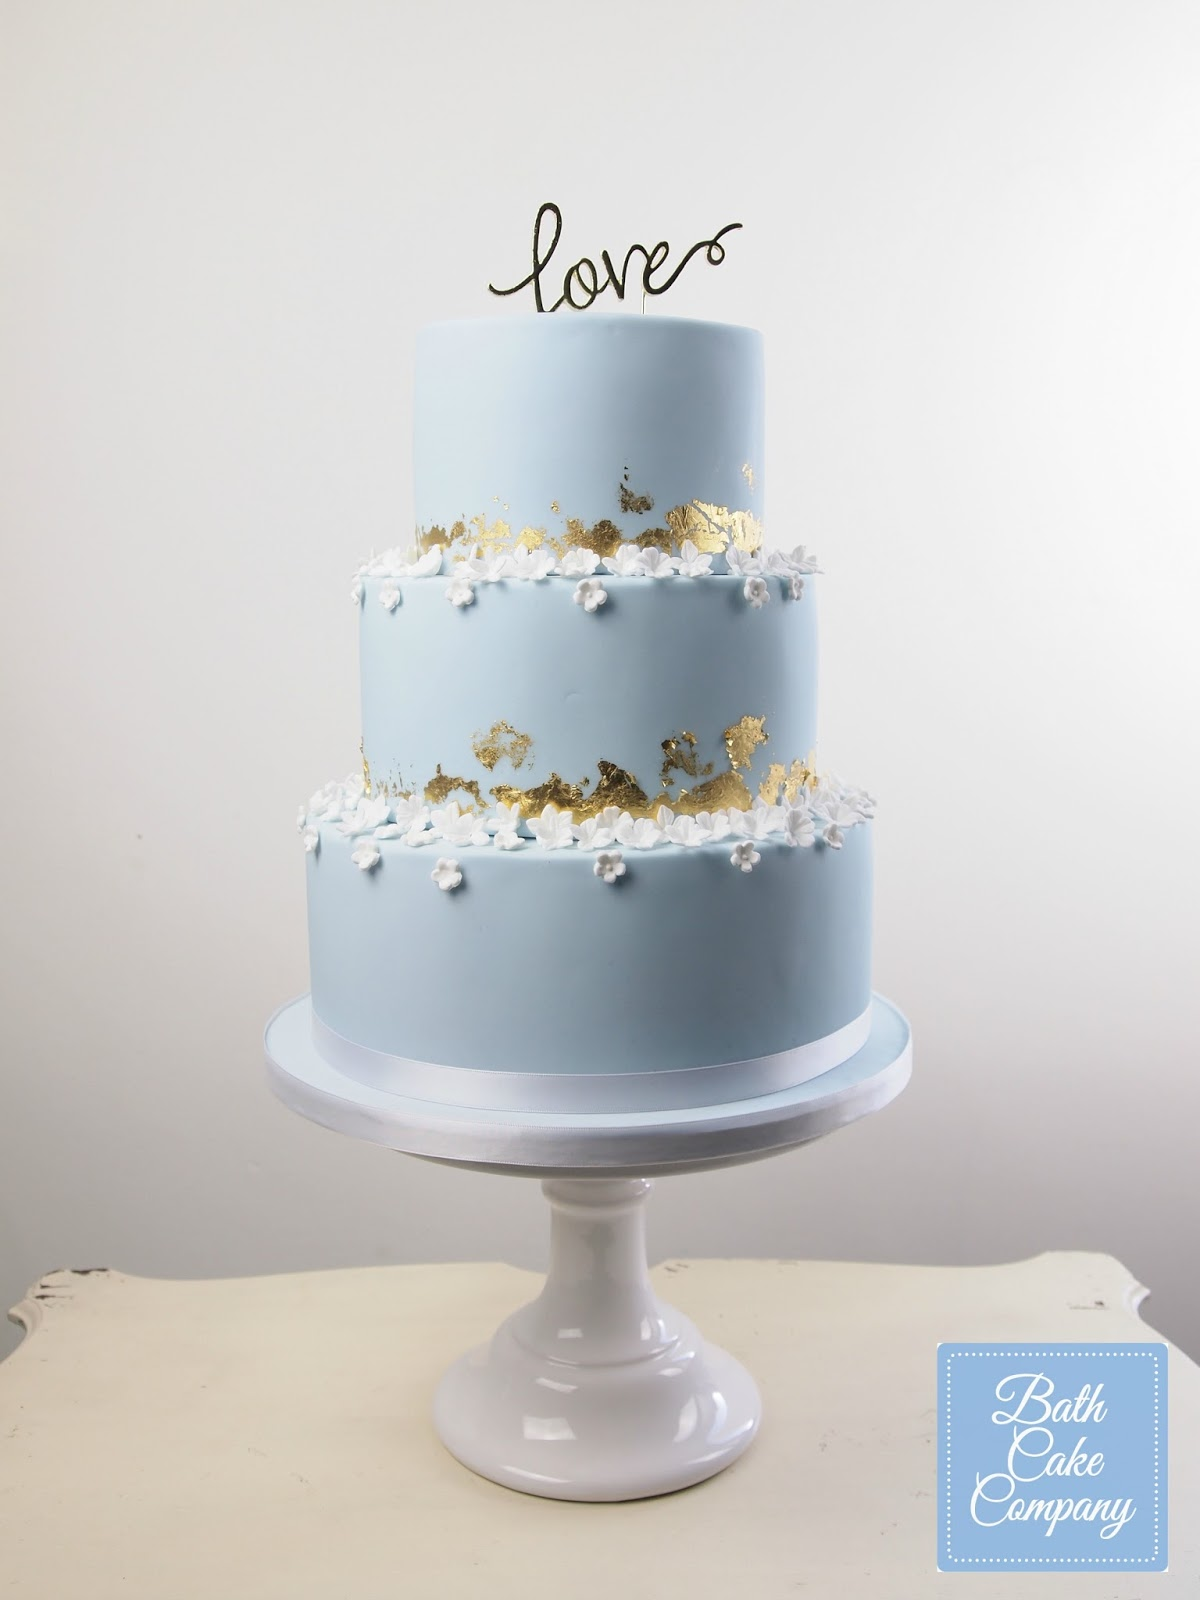 Bristol Vintage Wedding Fair: BATH CAKE COMPANY - AWARD WINNING ...